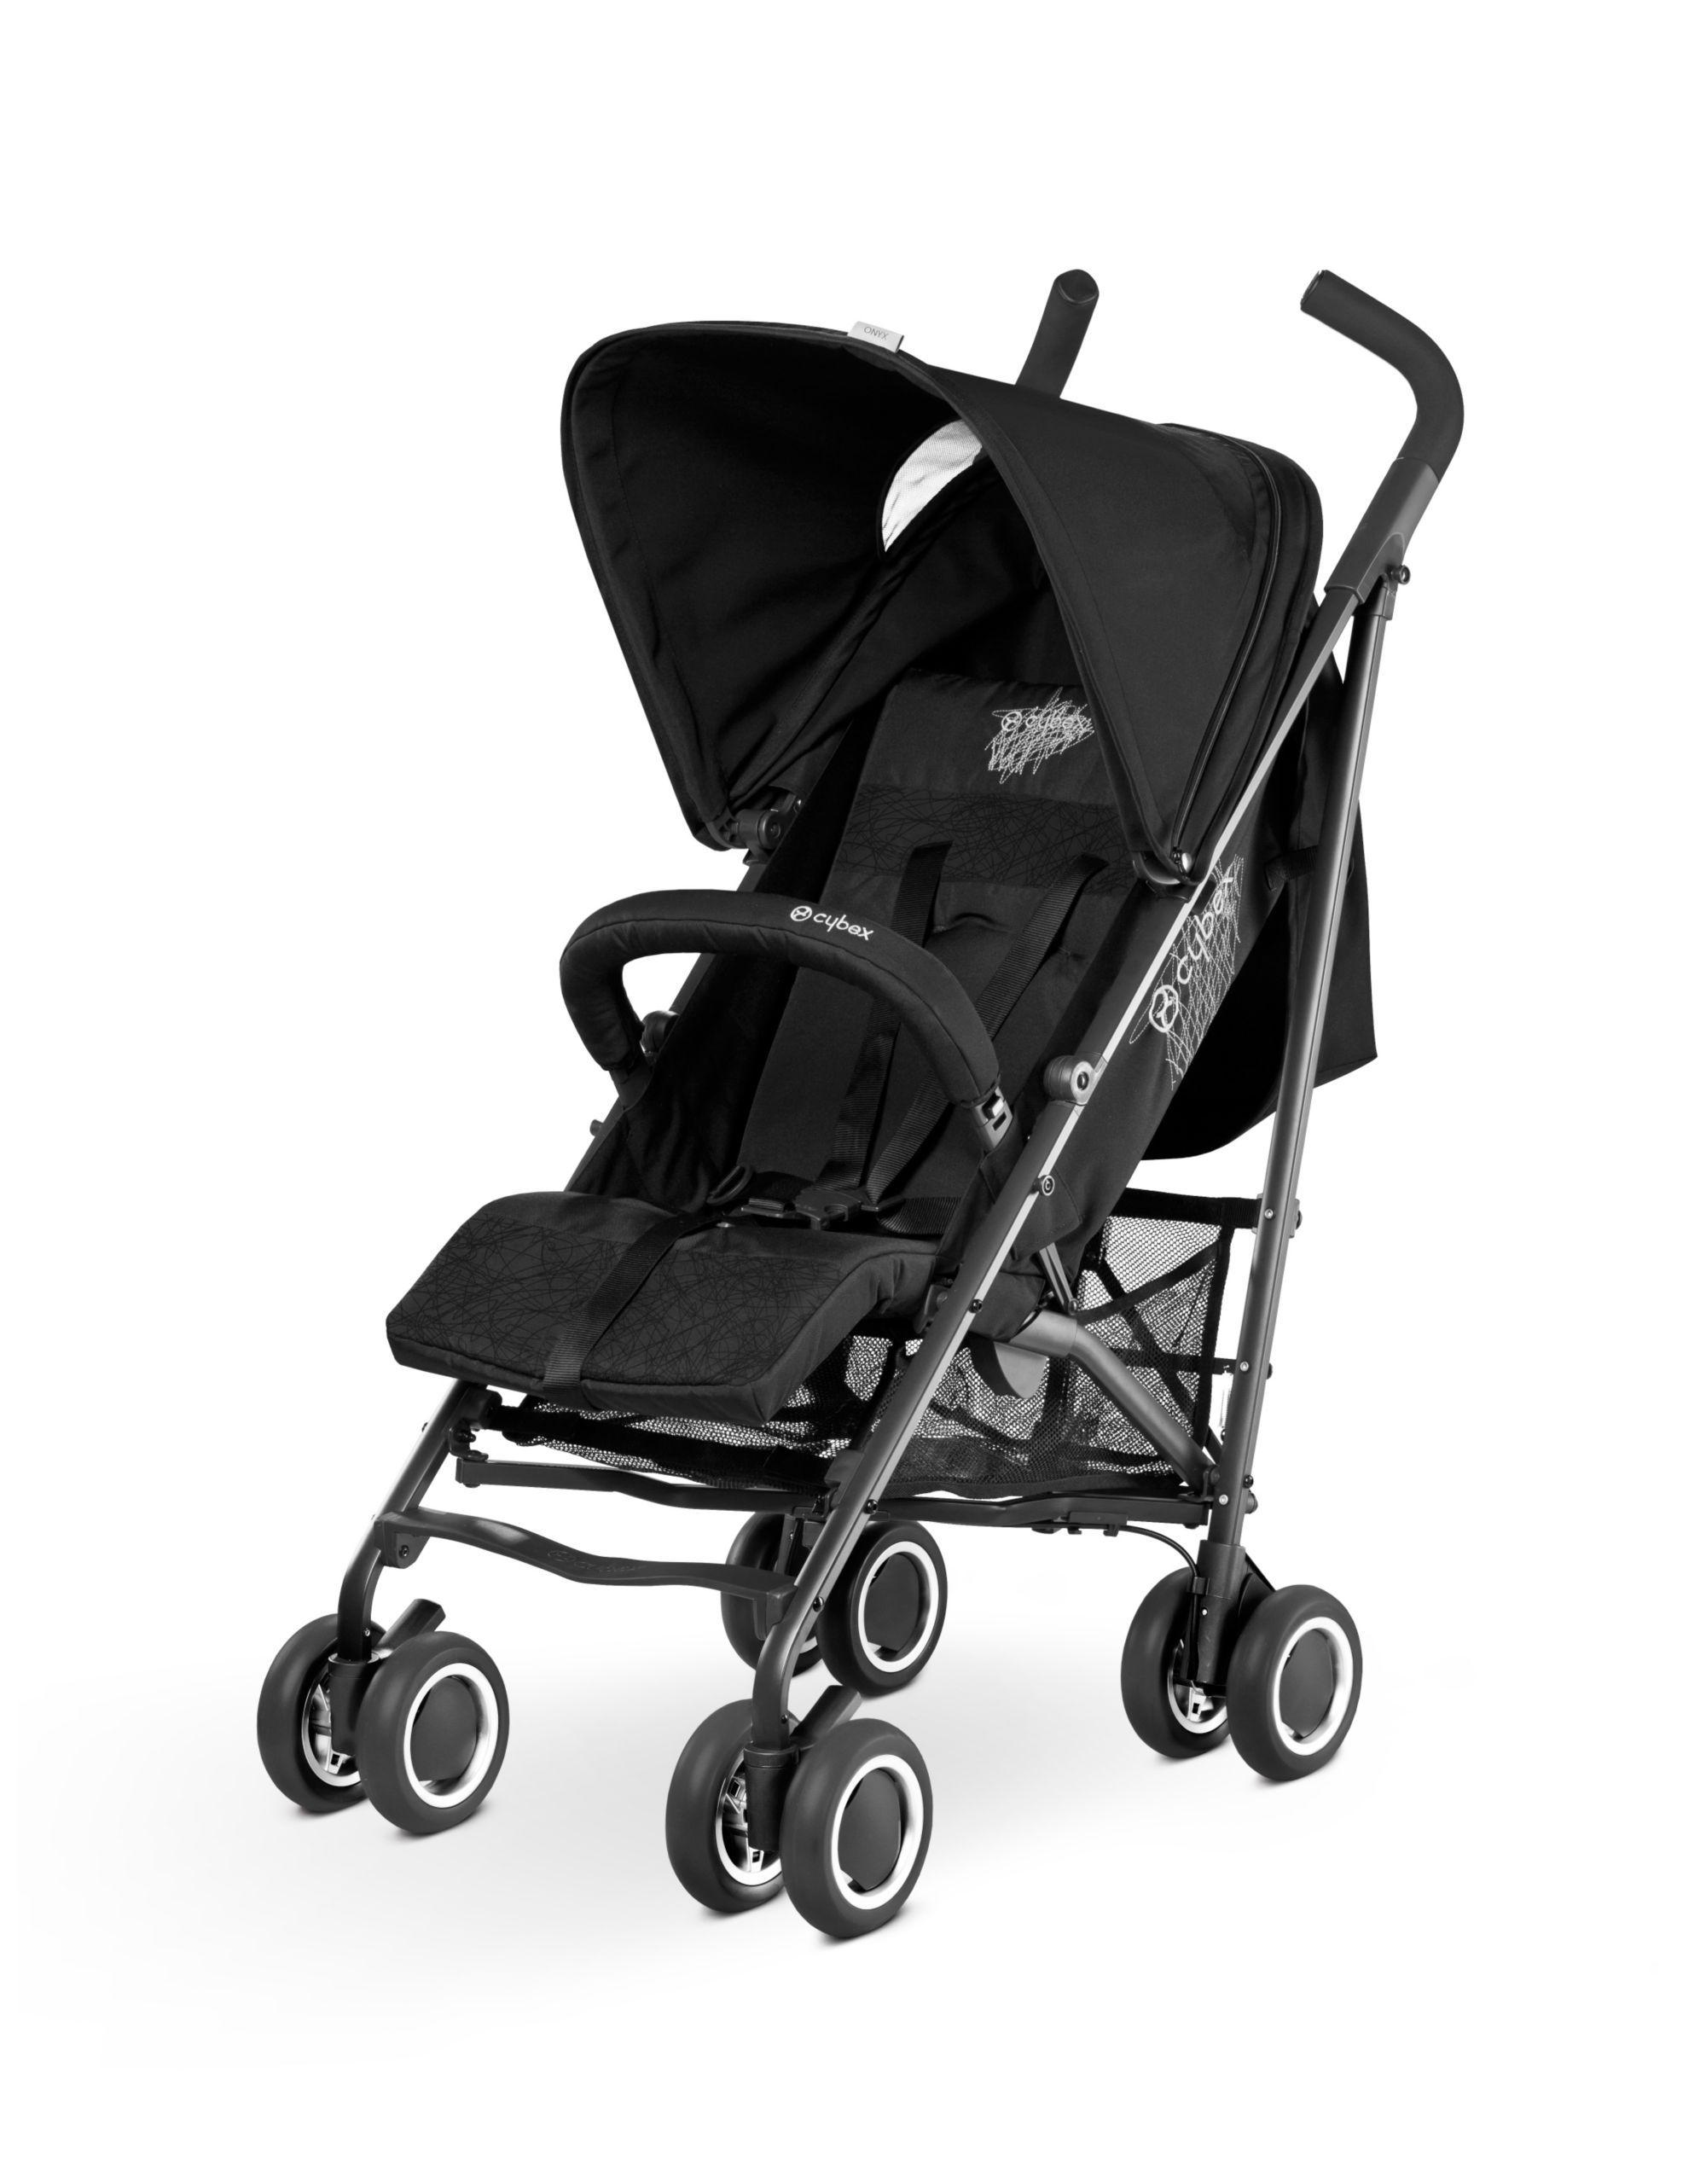 Cybex Onyx Stroller Black buggies & strollers